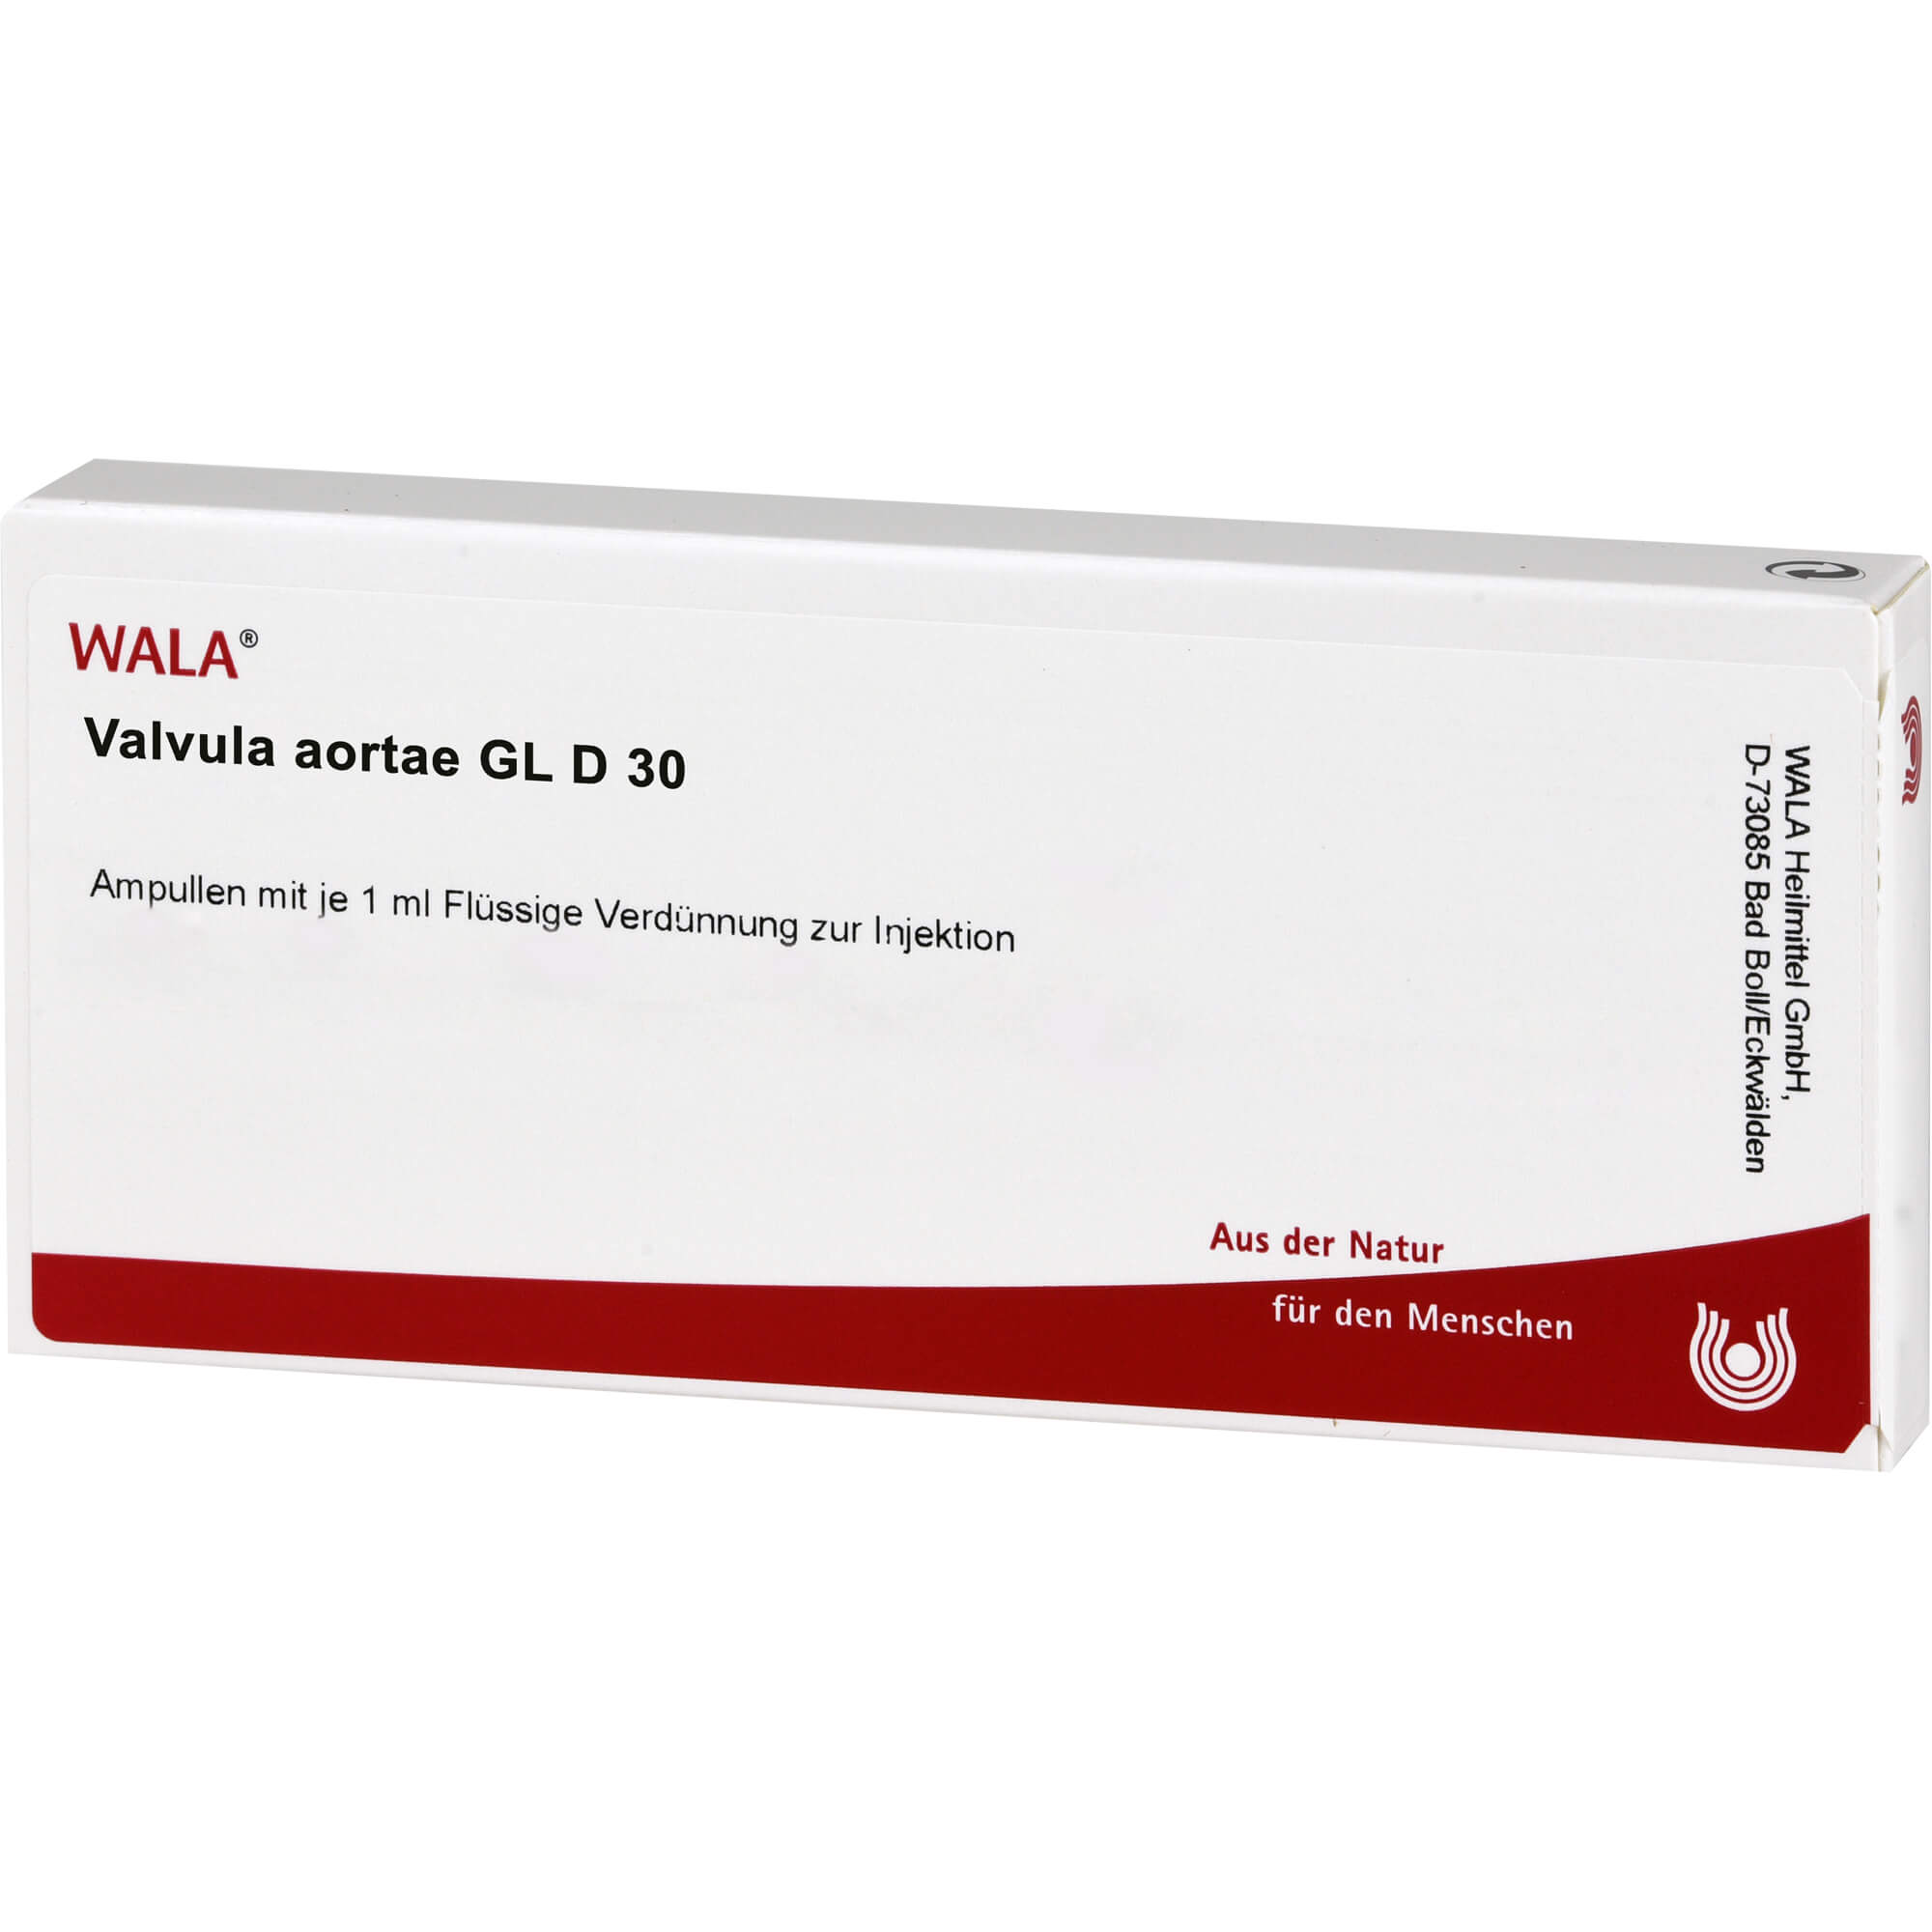 VALVULA aortae GL D 30 Ampullen